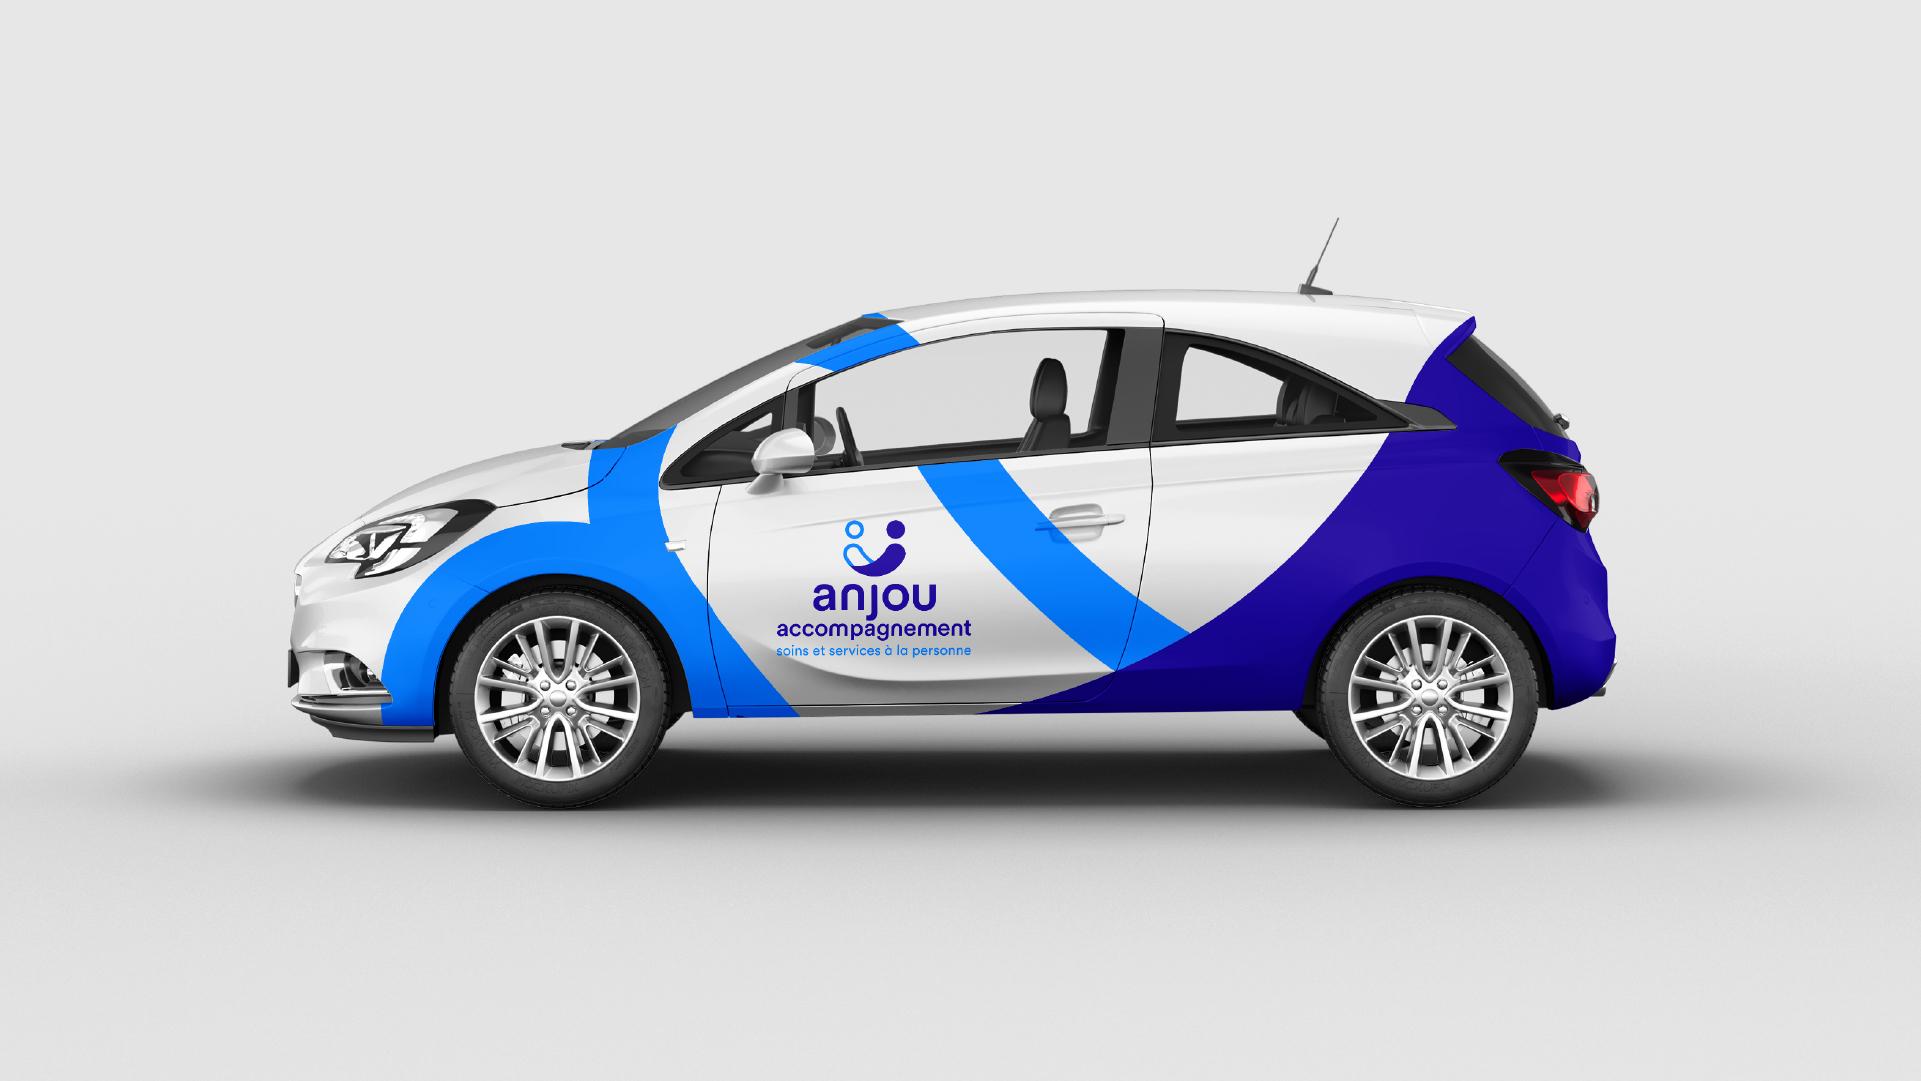 Anjou Accompagnement Association Identite Visuelle Signaletique Marquage Vehicule